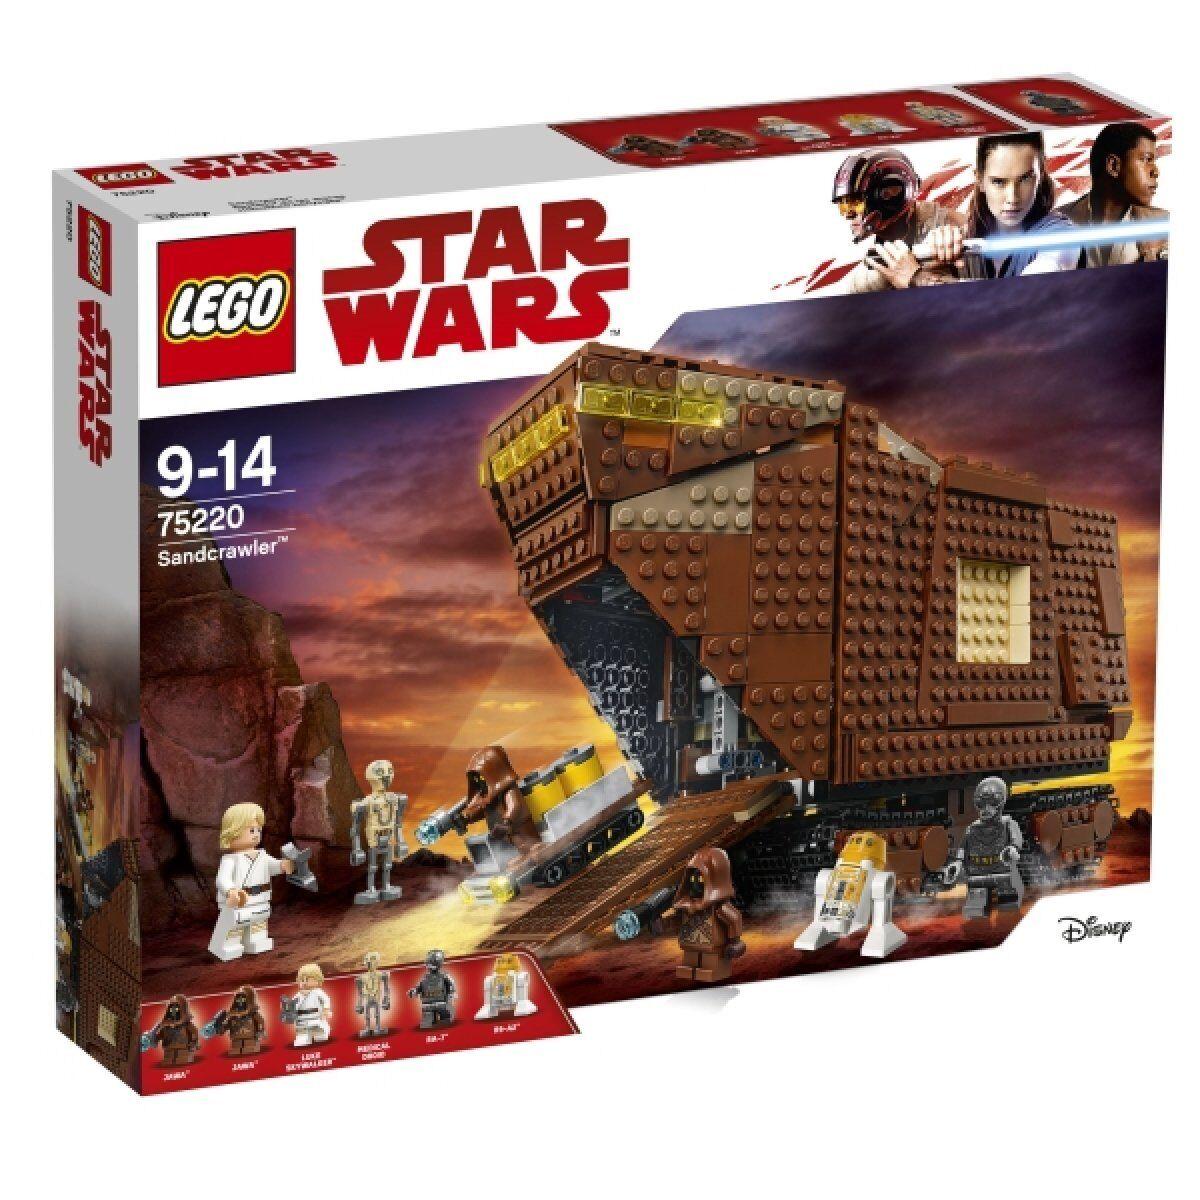 Lego star wars sandcrawler 75220 Nouveau neuf dans sa boîte